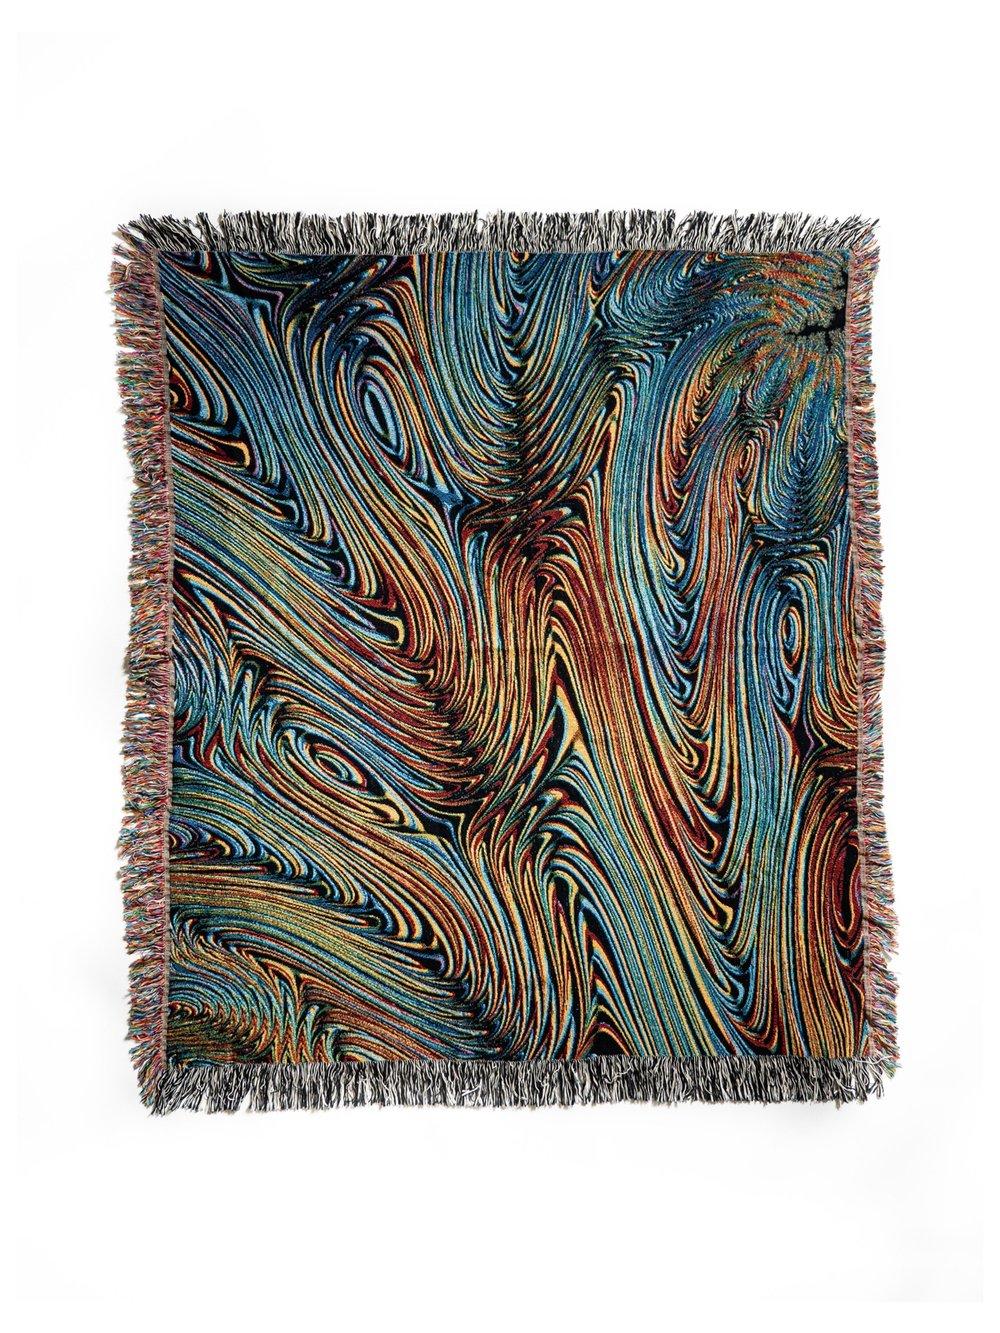 Woven Blanket #32